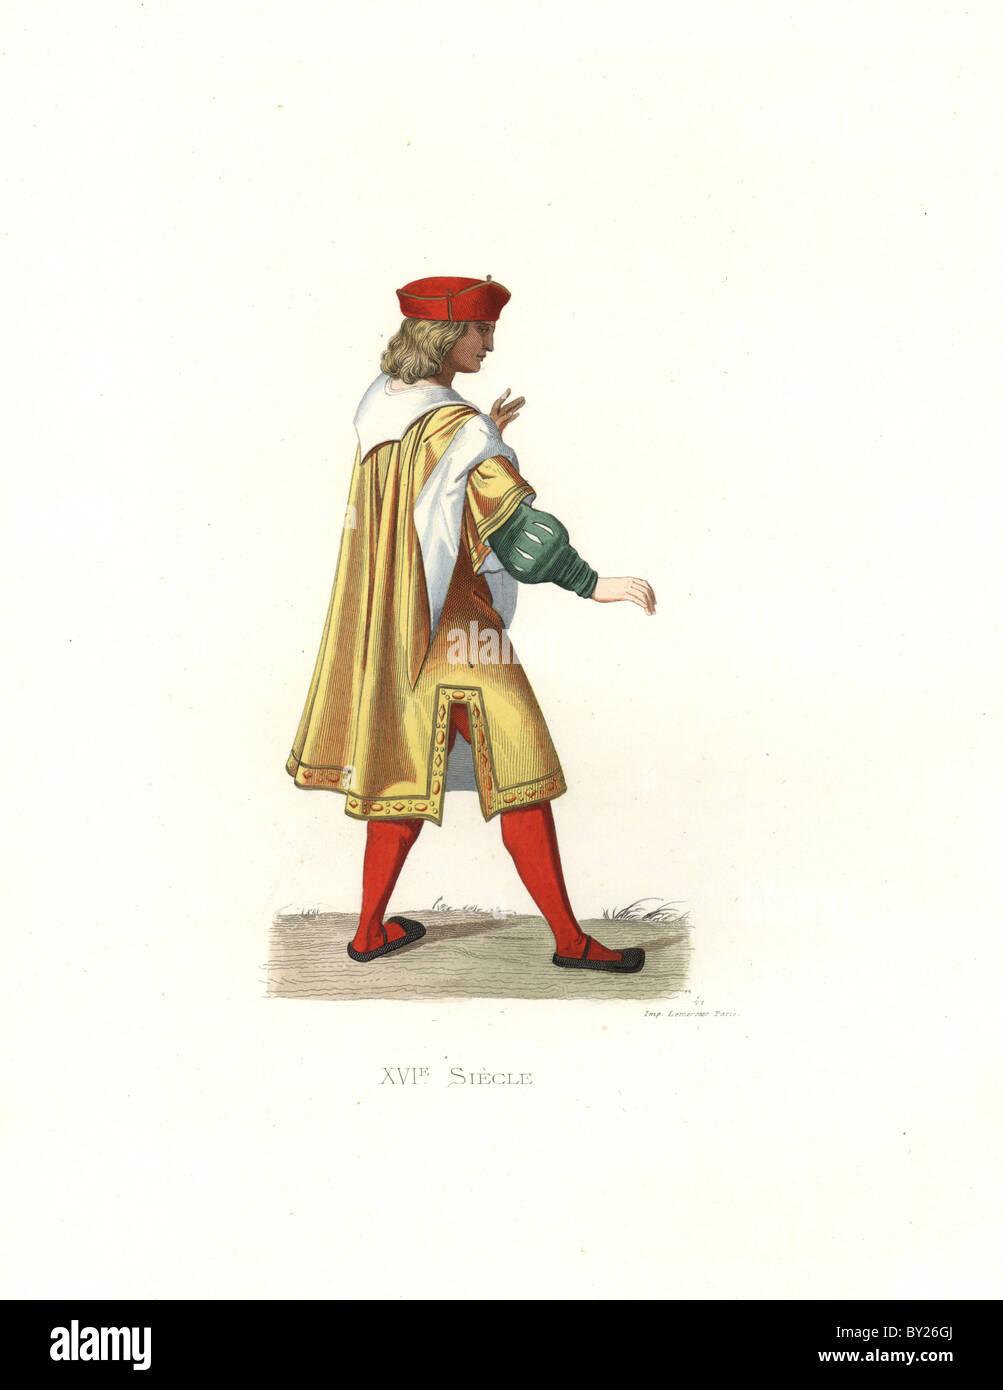 French merchant, 16th century. - Stock Image